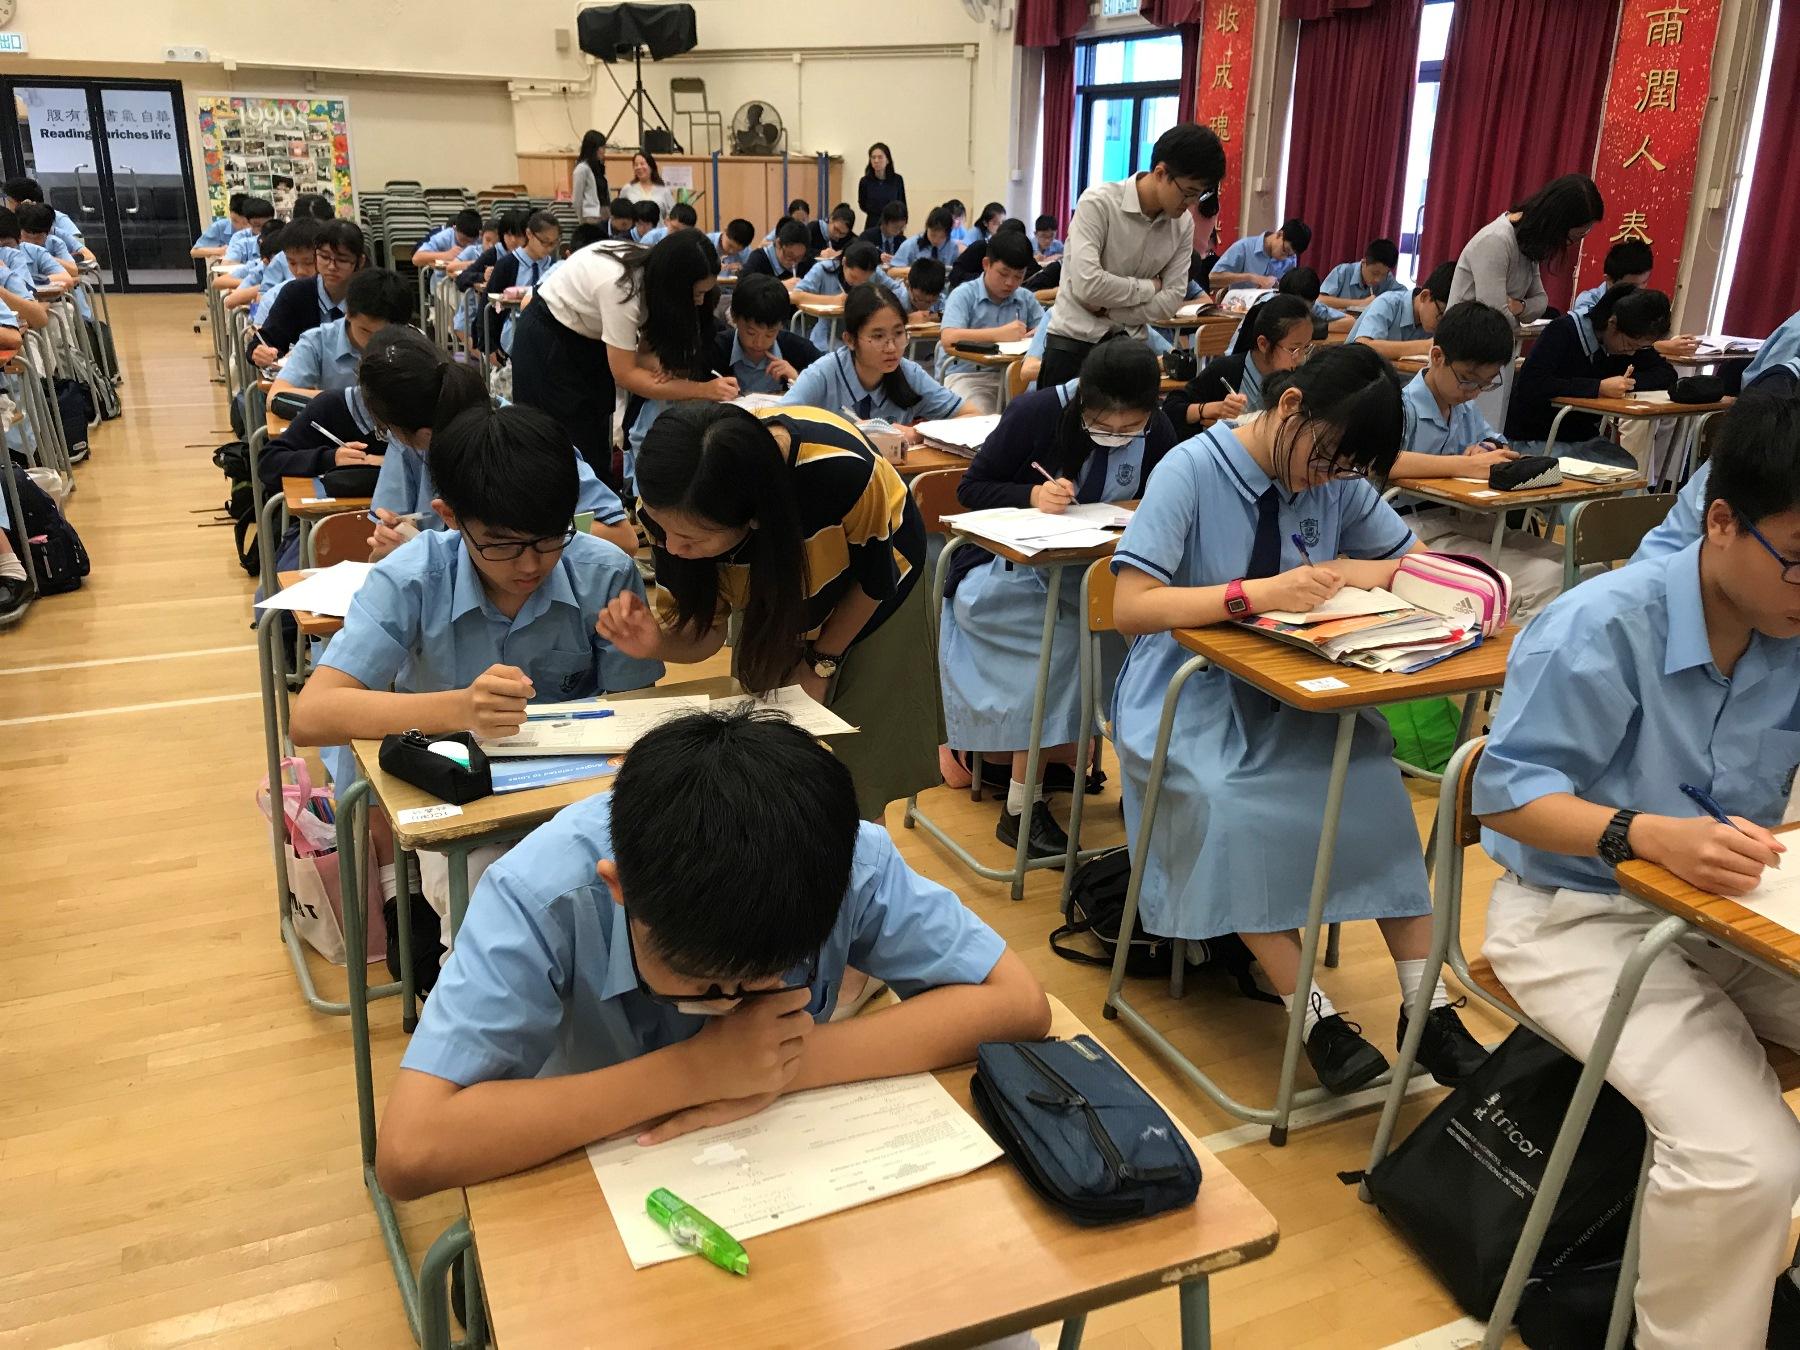 http://npc.edu.hk/sites/default/files/img_4051_2.jpg